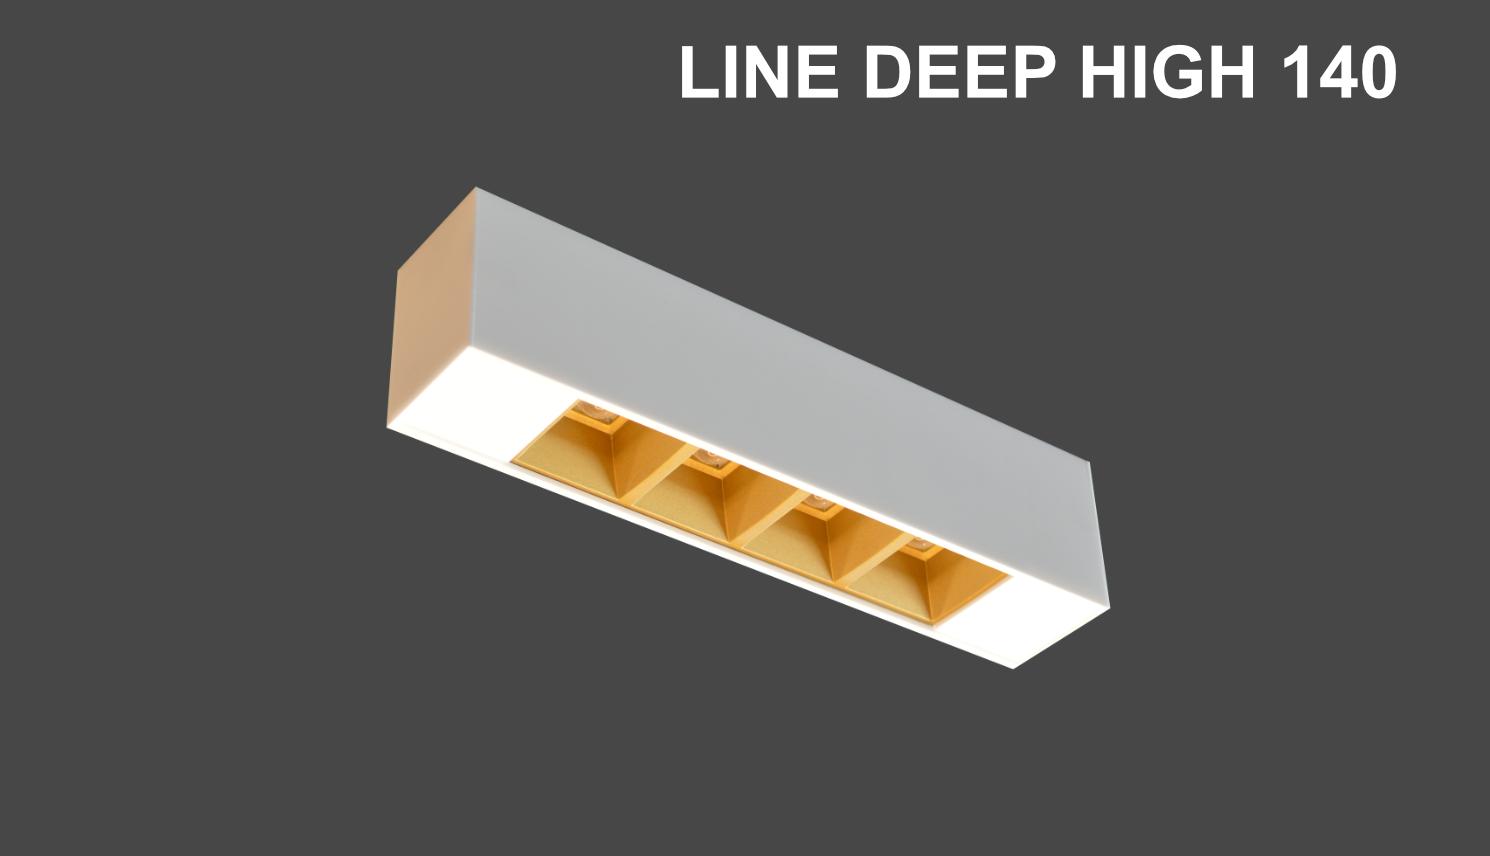 LINE DEEP HIGH 140